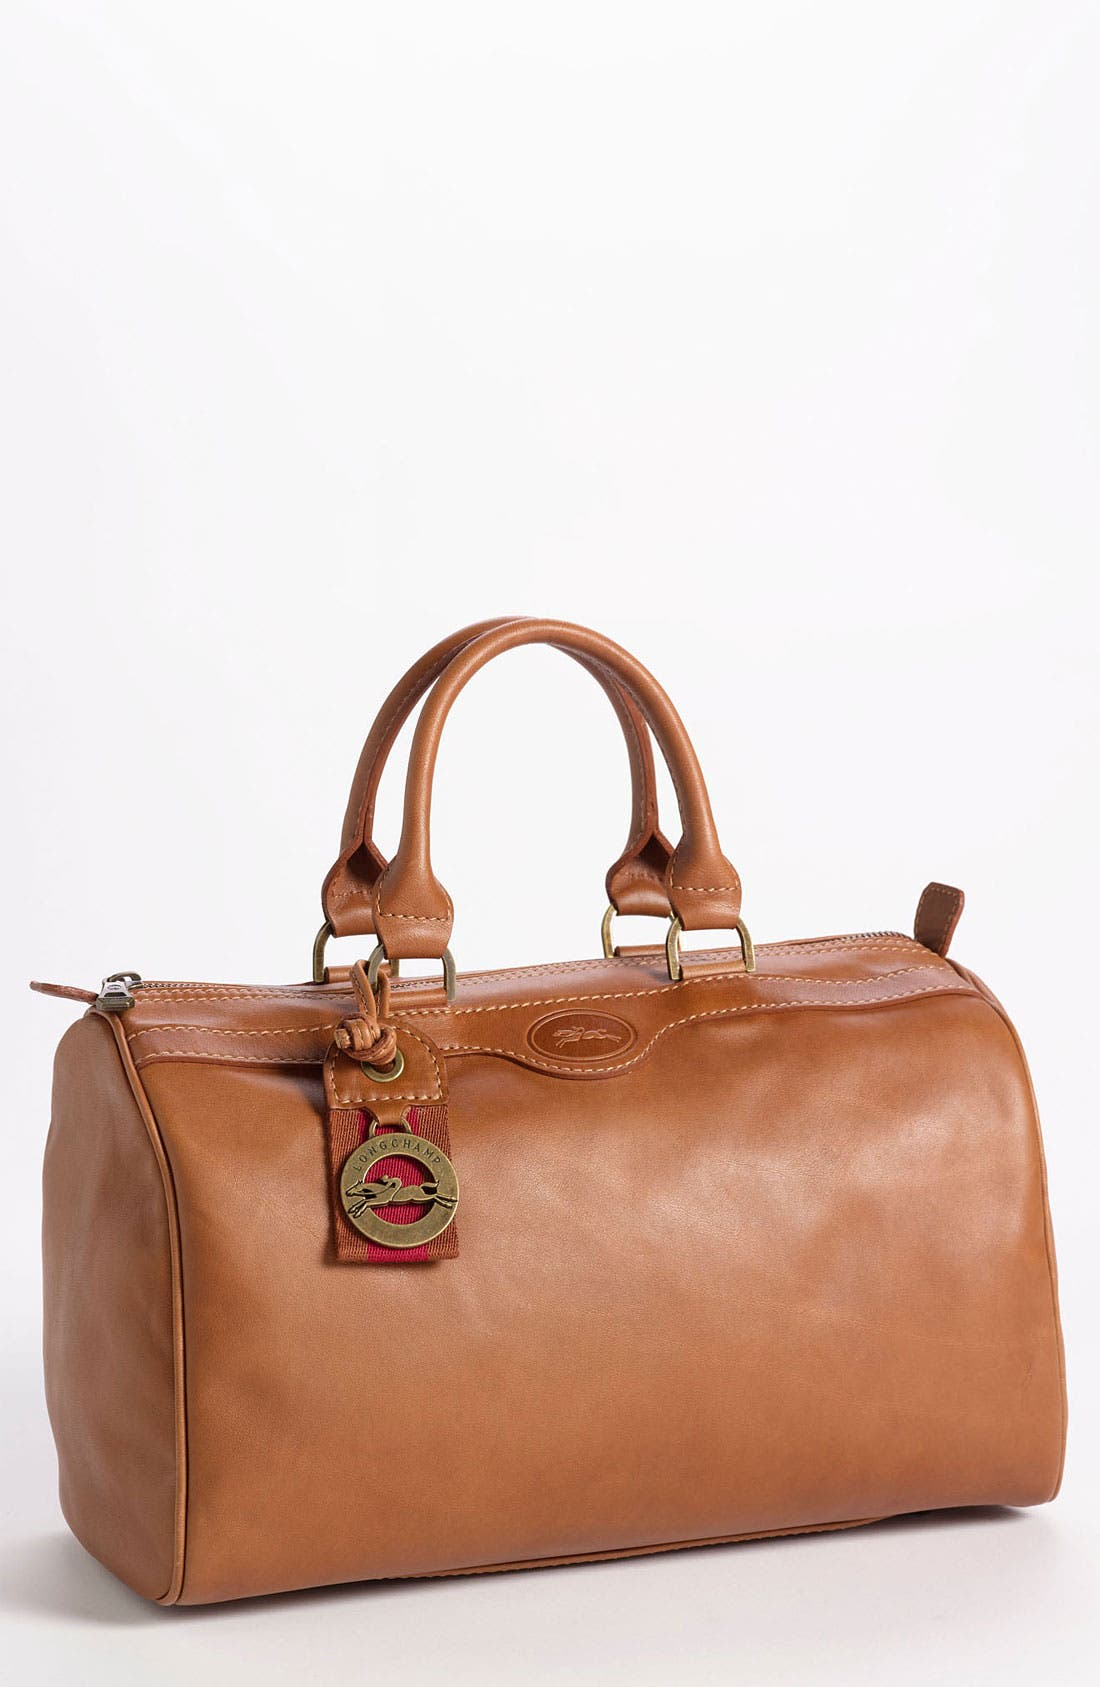 Alternate Image 1 Selected - Longchamp 'Au Sultan' Leather Satchel